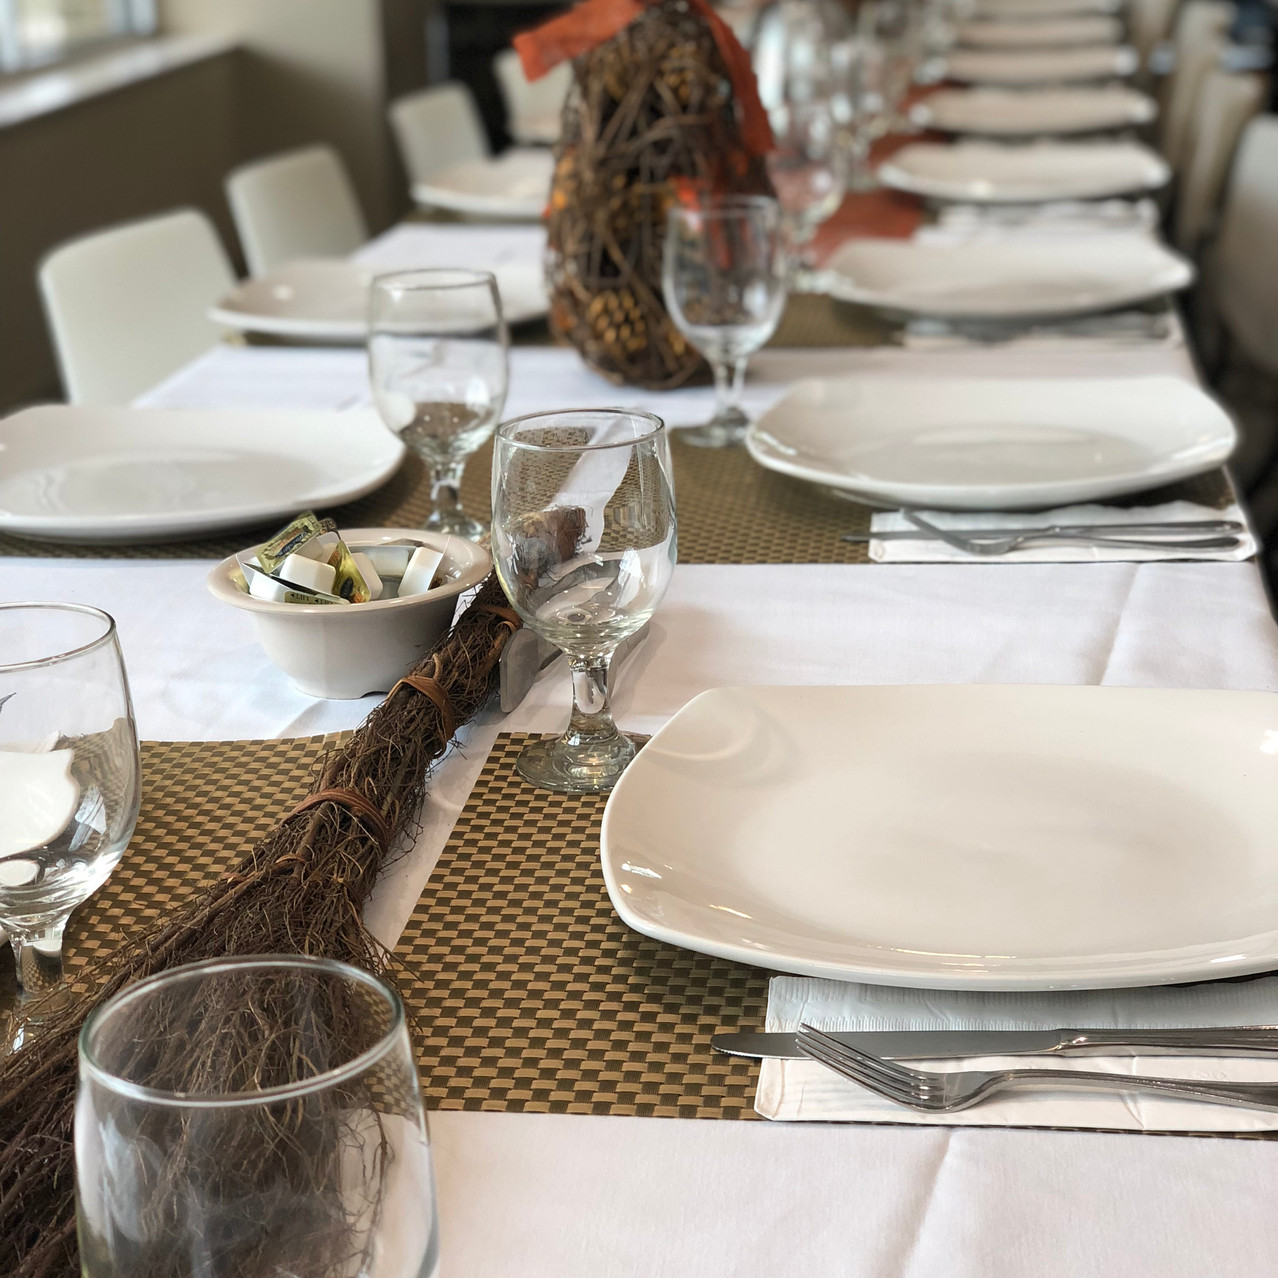 Friendsgiving table set up.